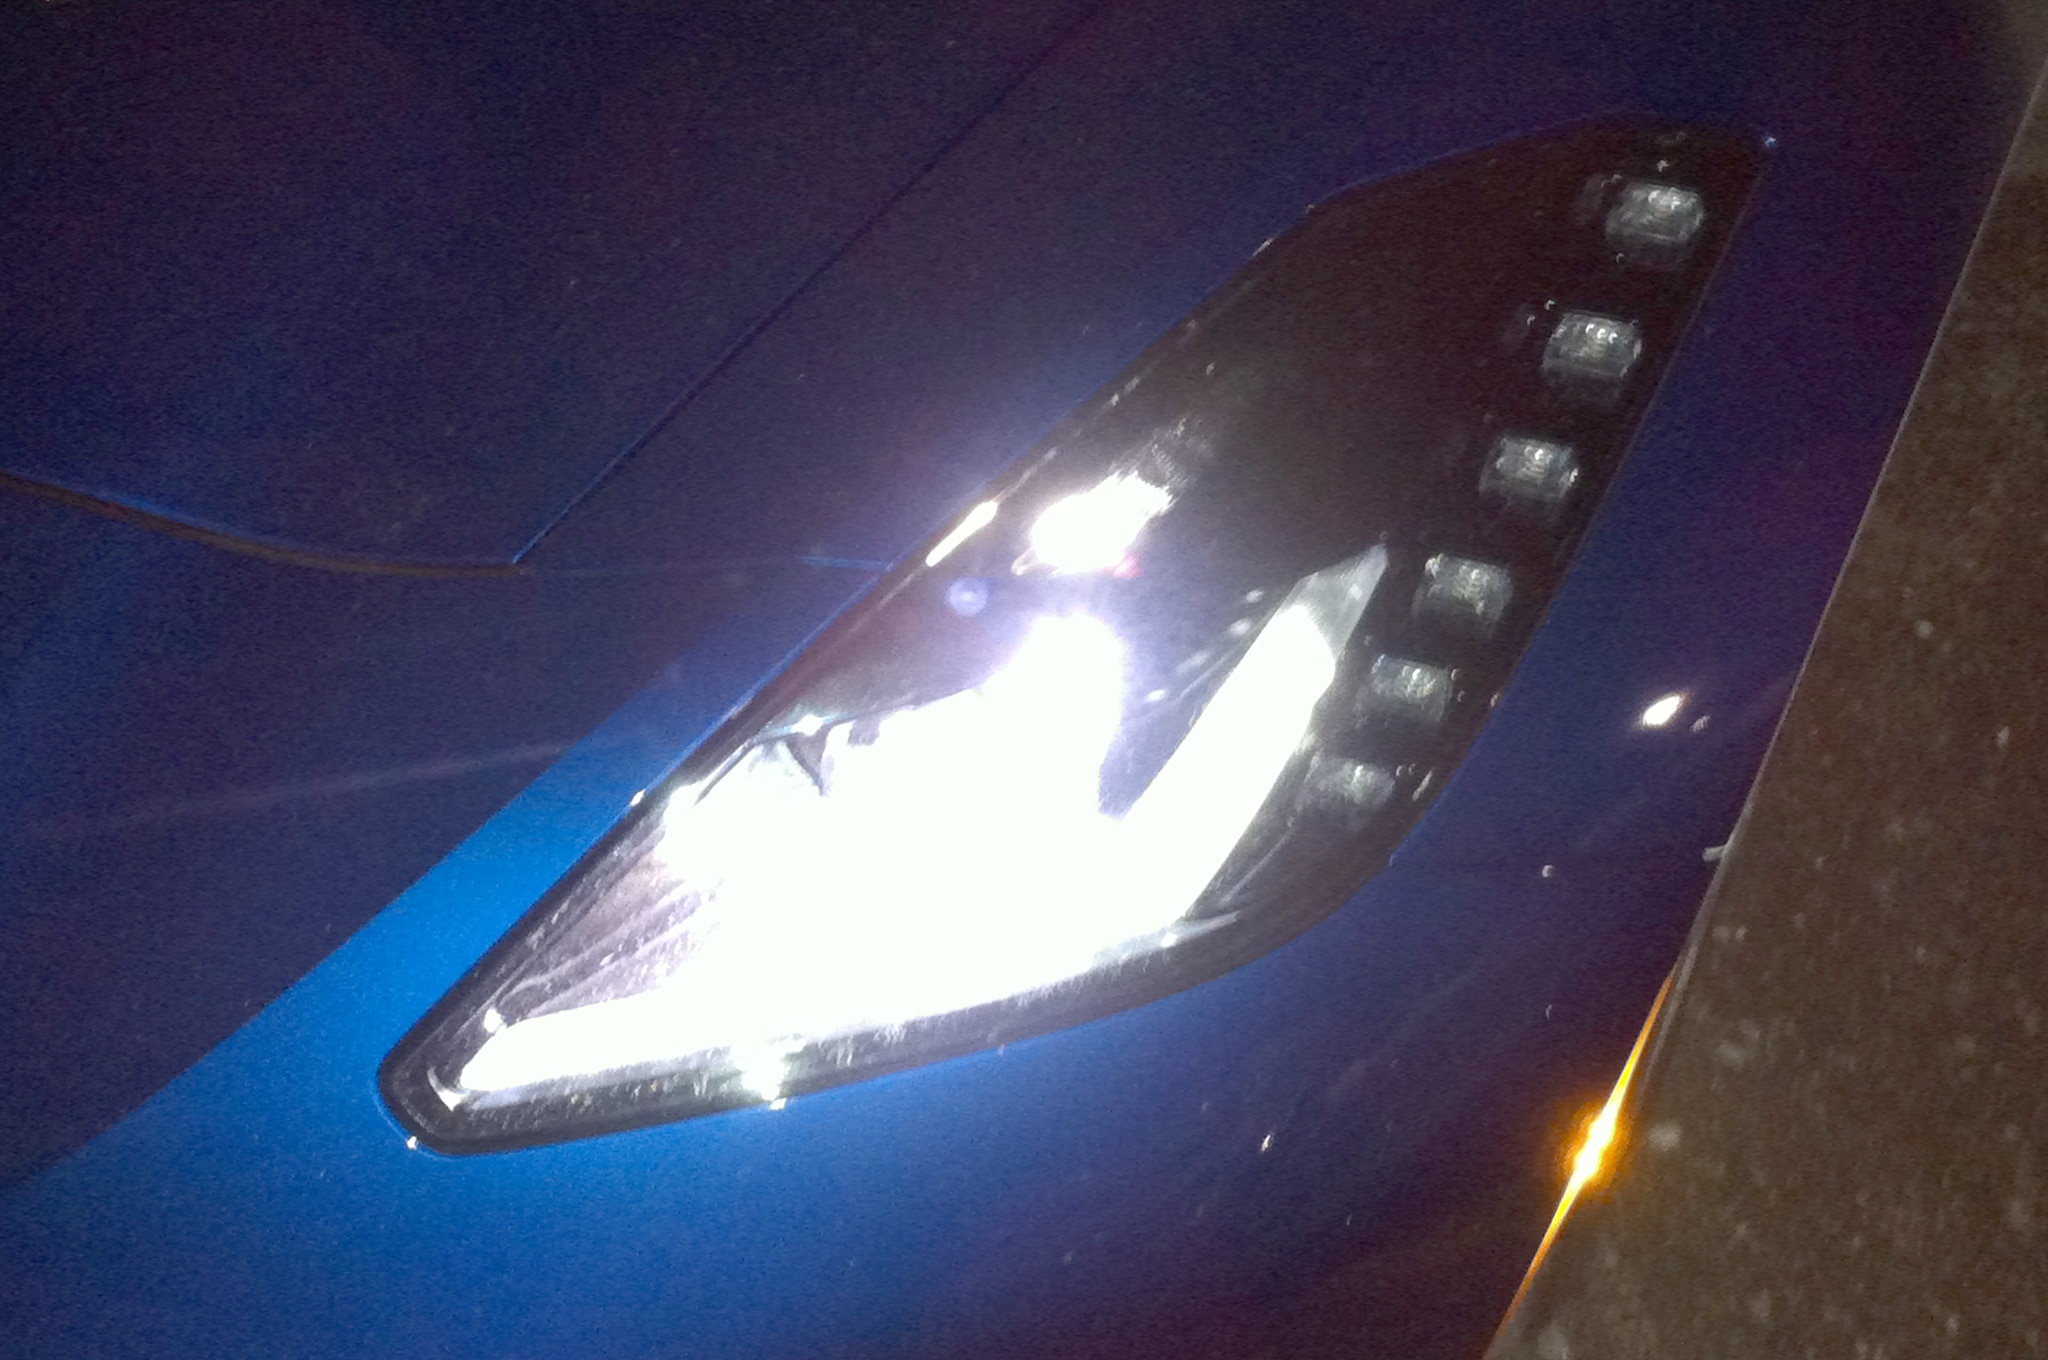 2014 chevrolet corvette stingray convertible headlight - Corvette Stingray Light Blue